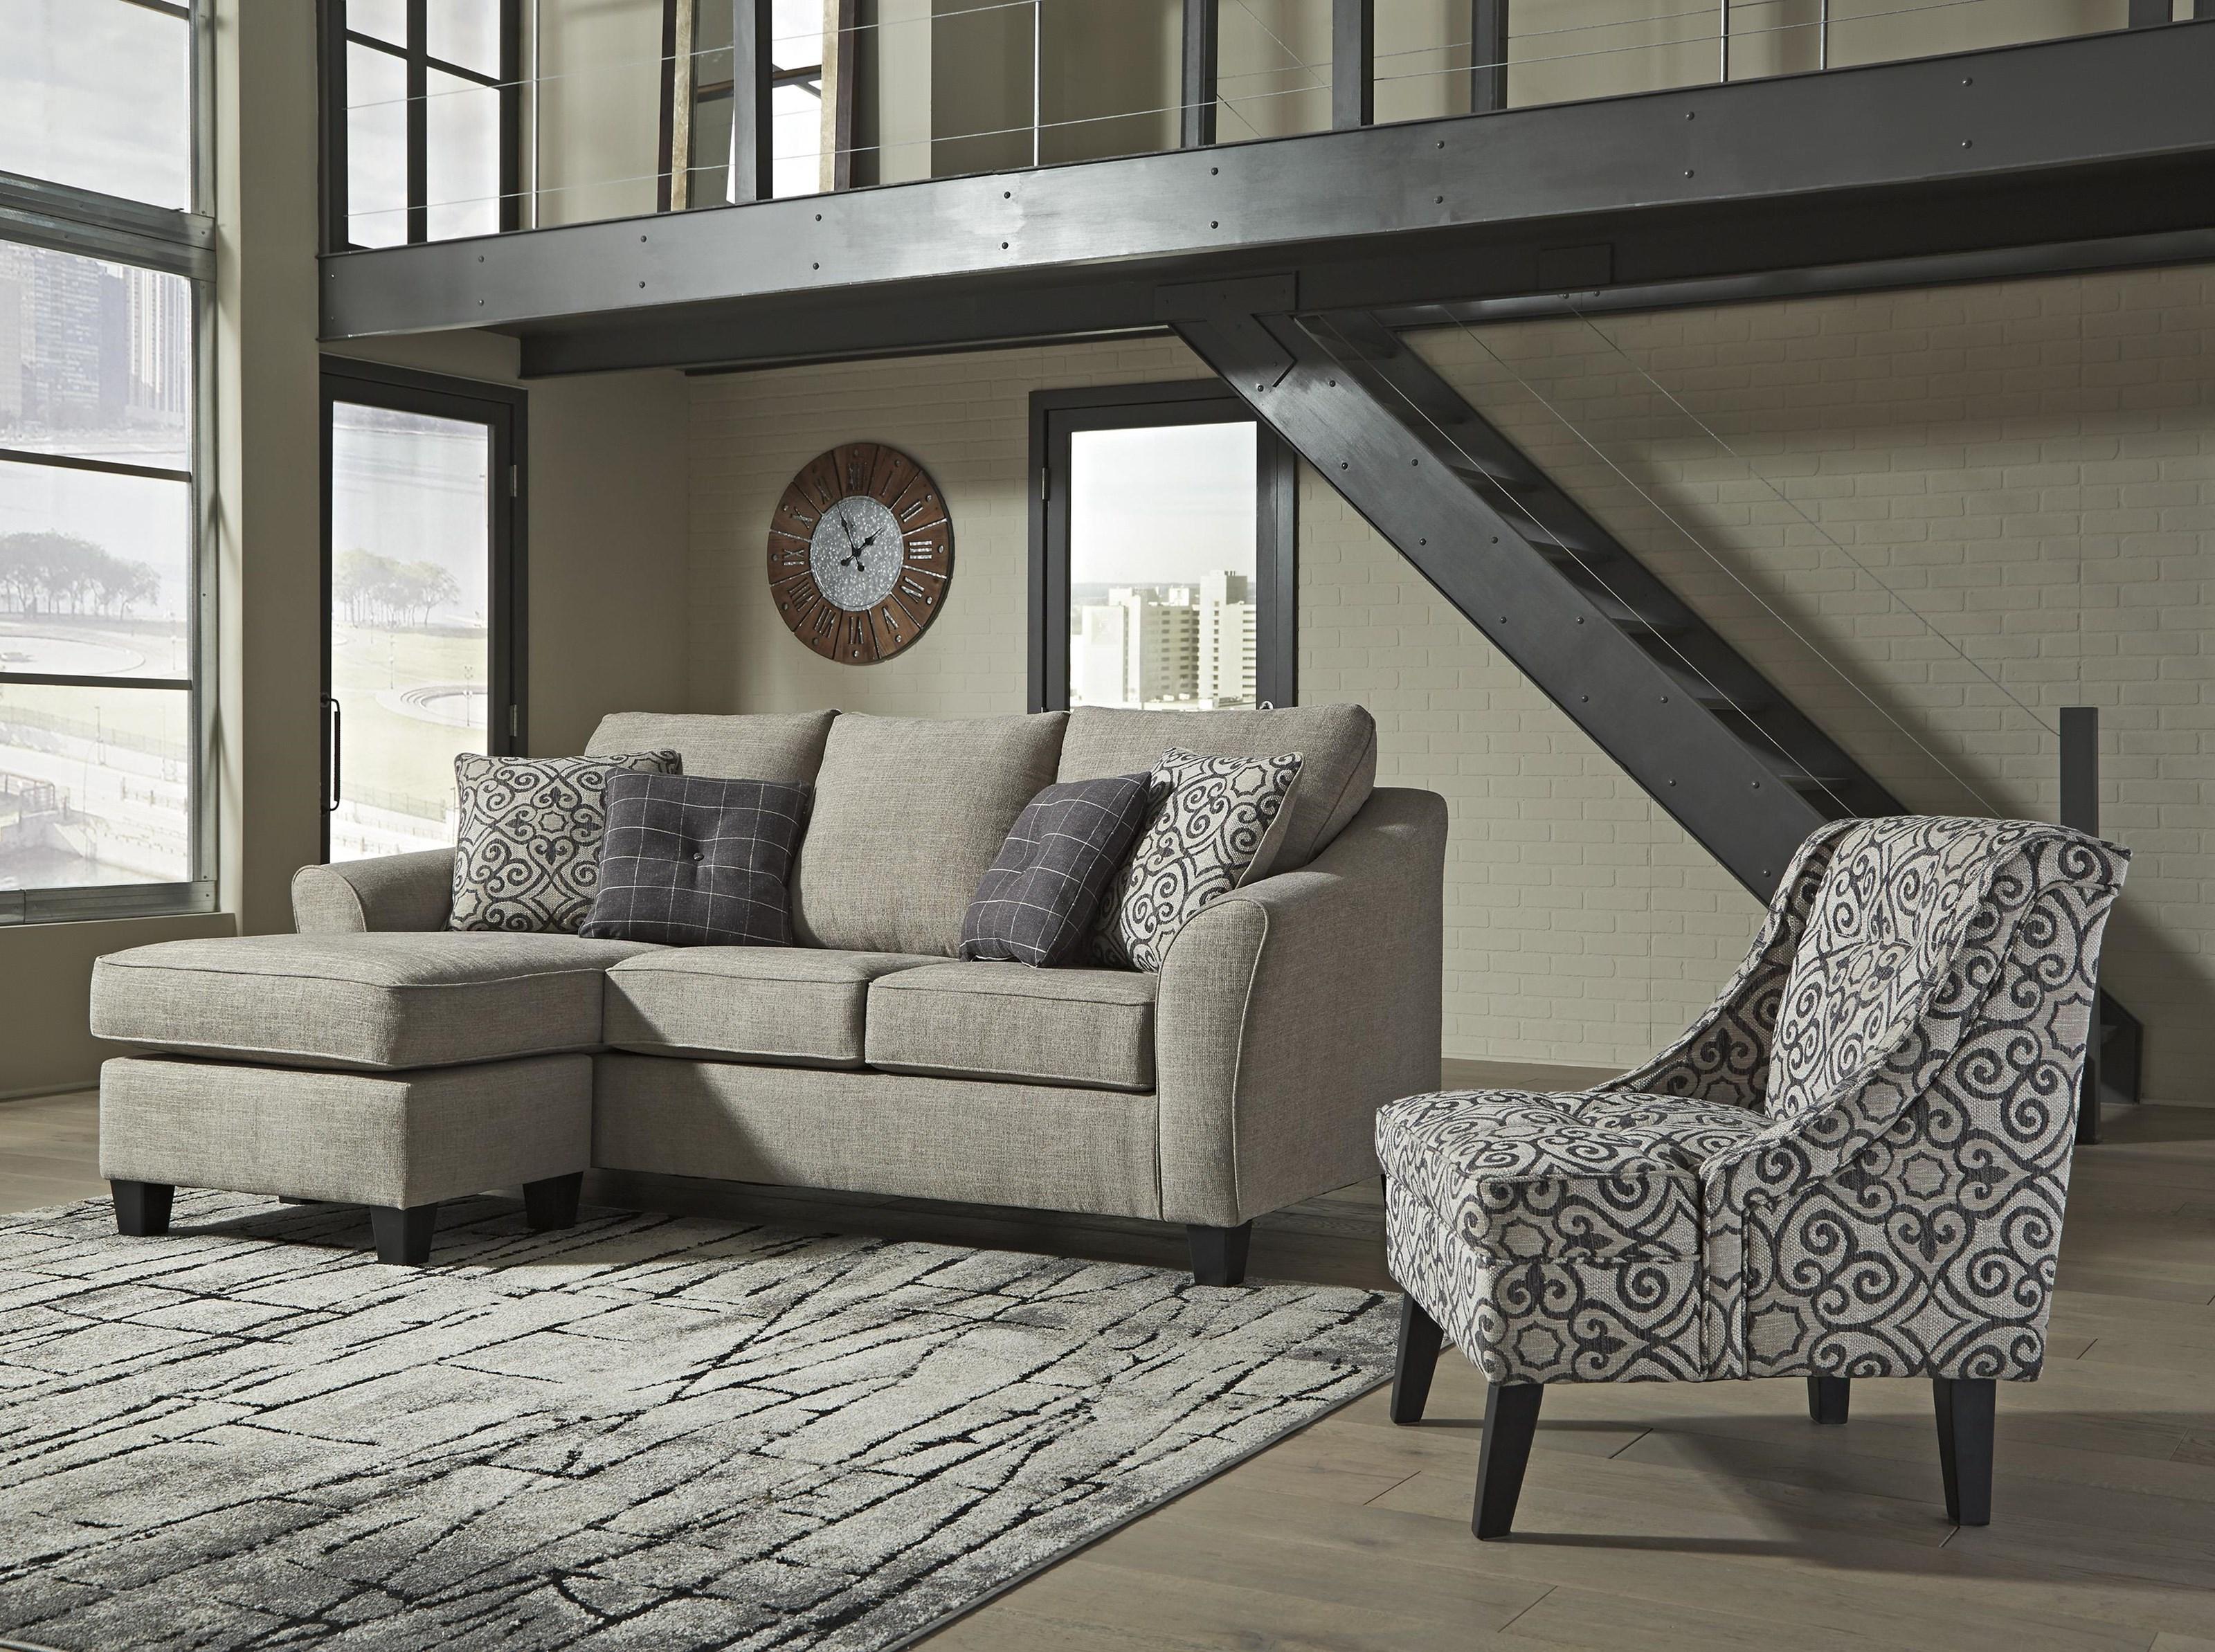 Kestrel 2 Piece Living Room Set by Ashley Furniture at Sam Levitz Furniture